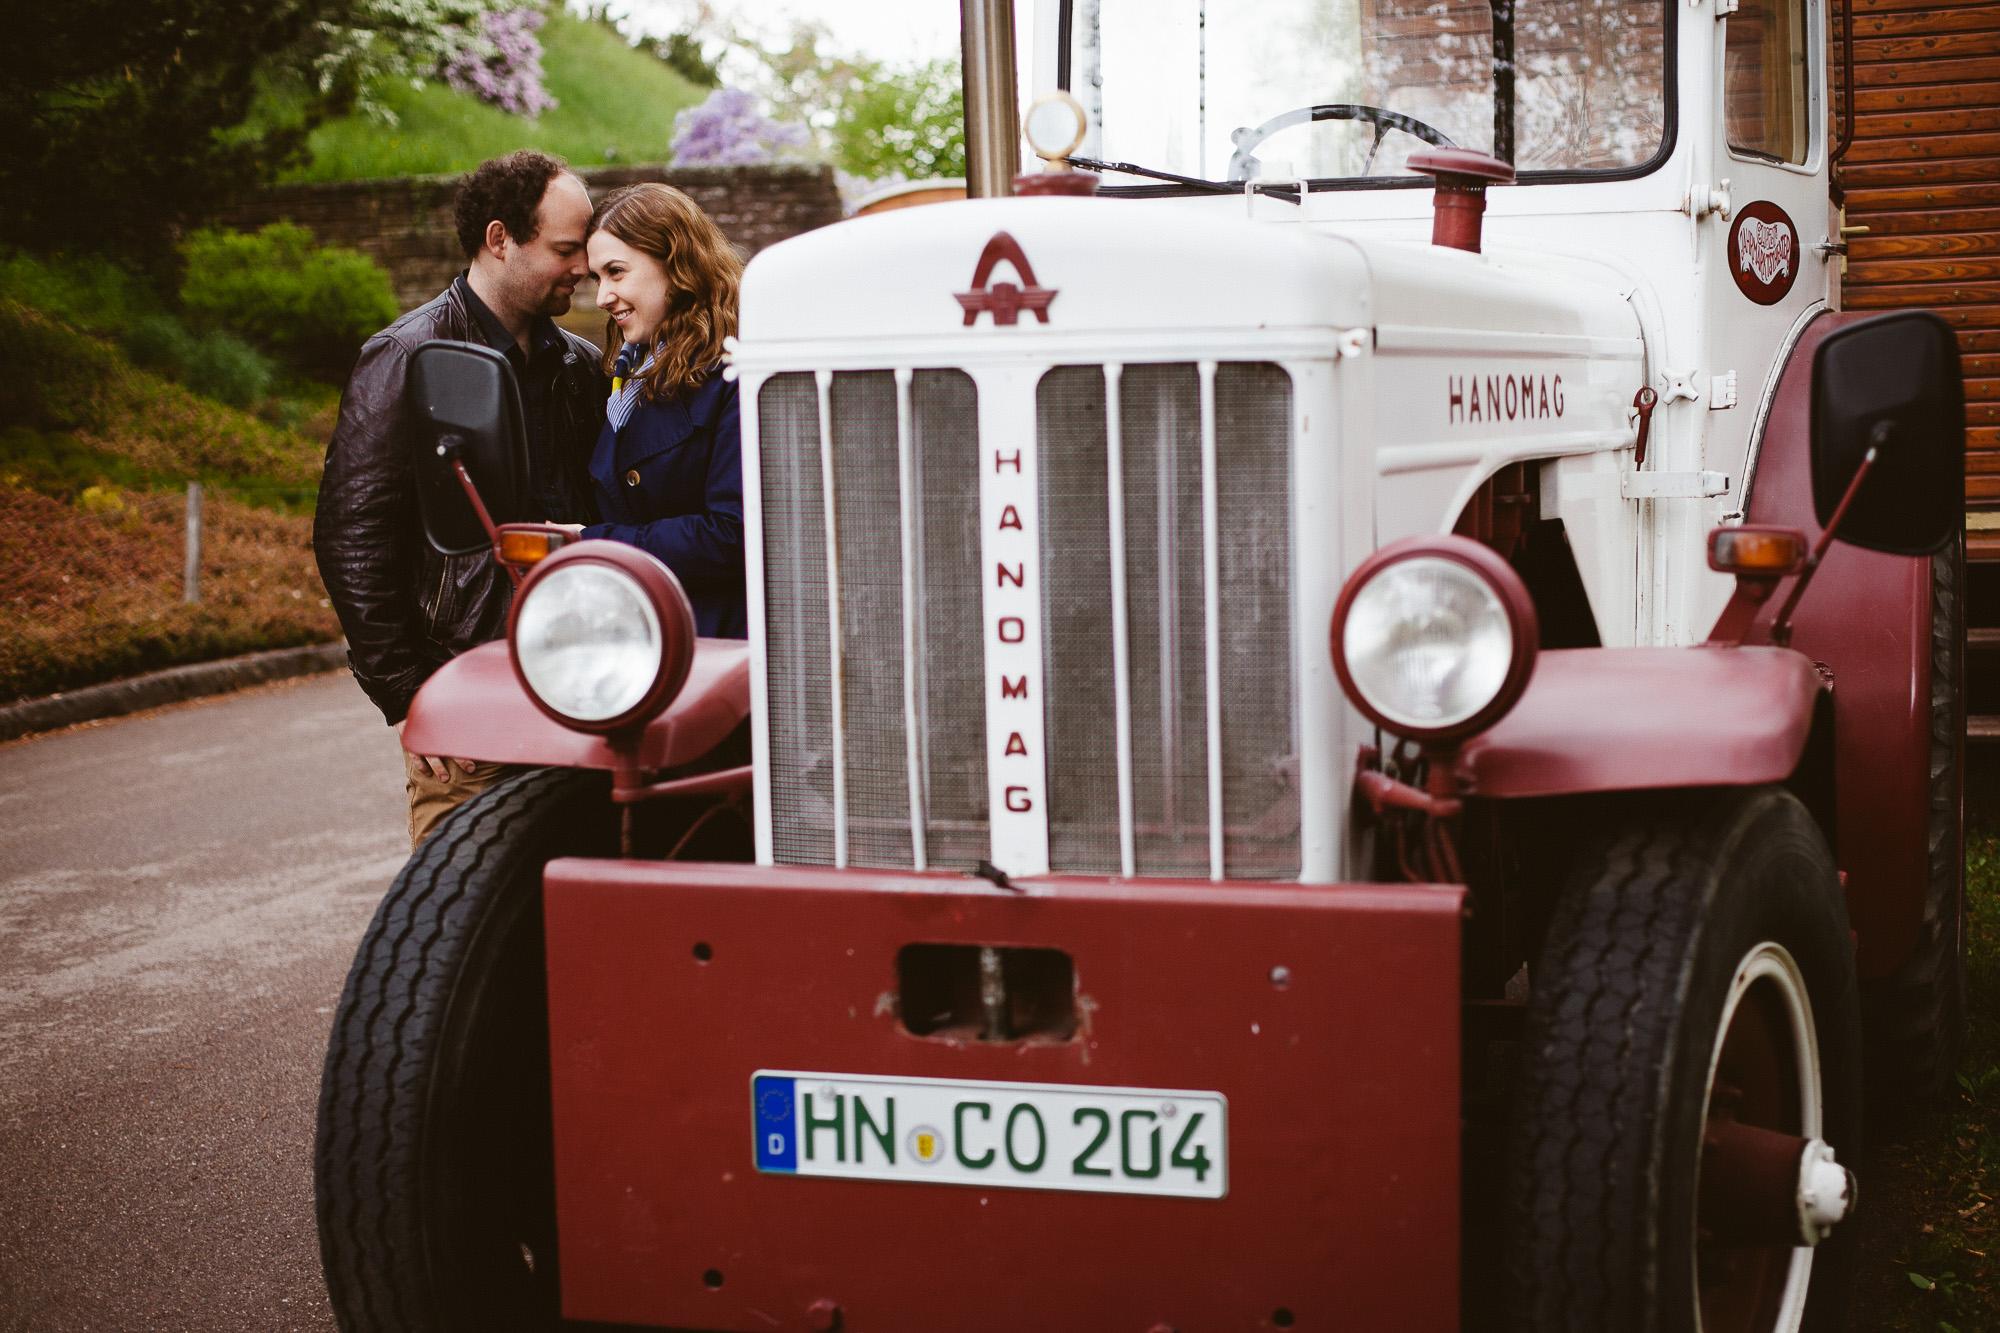 Helen-und-Sebastian-Engagement-by-Avec-Amis-46